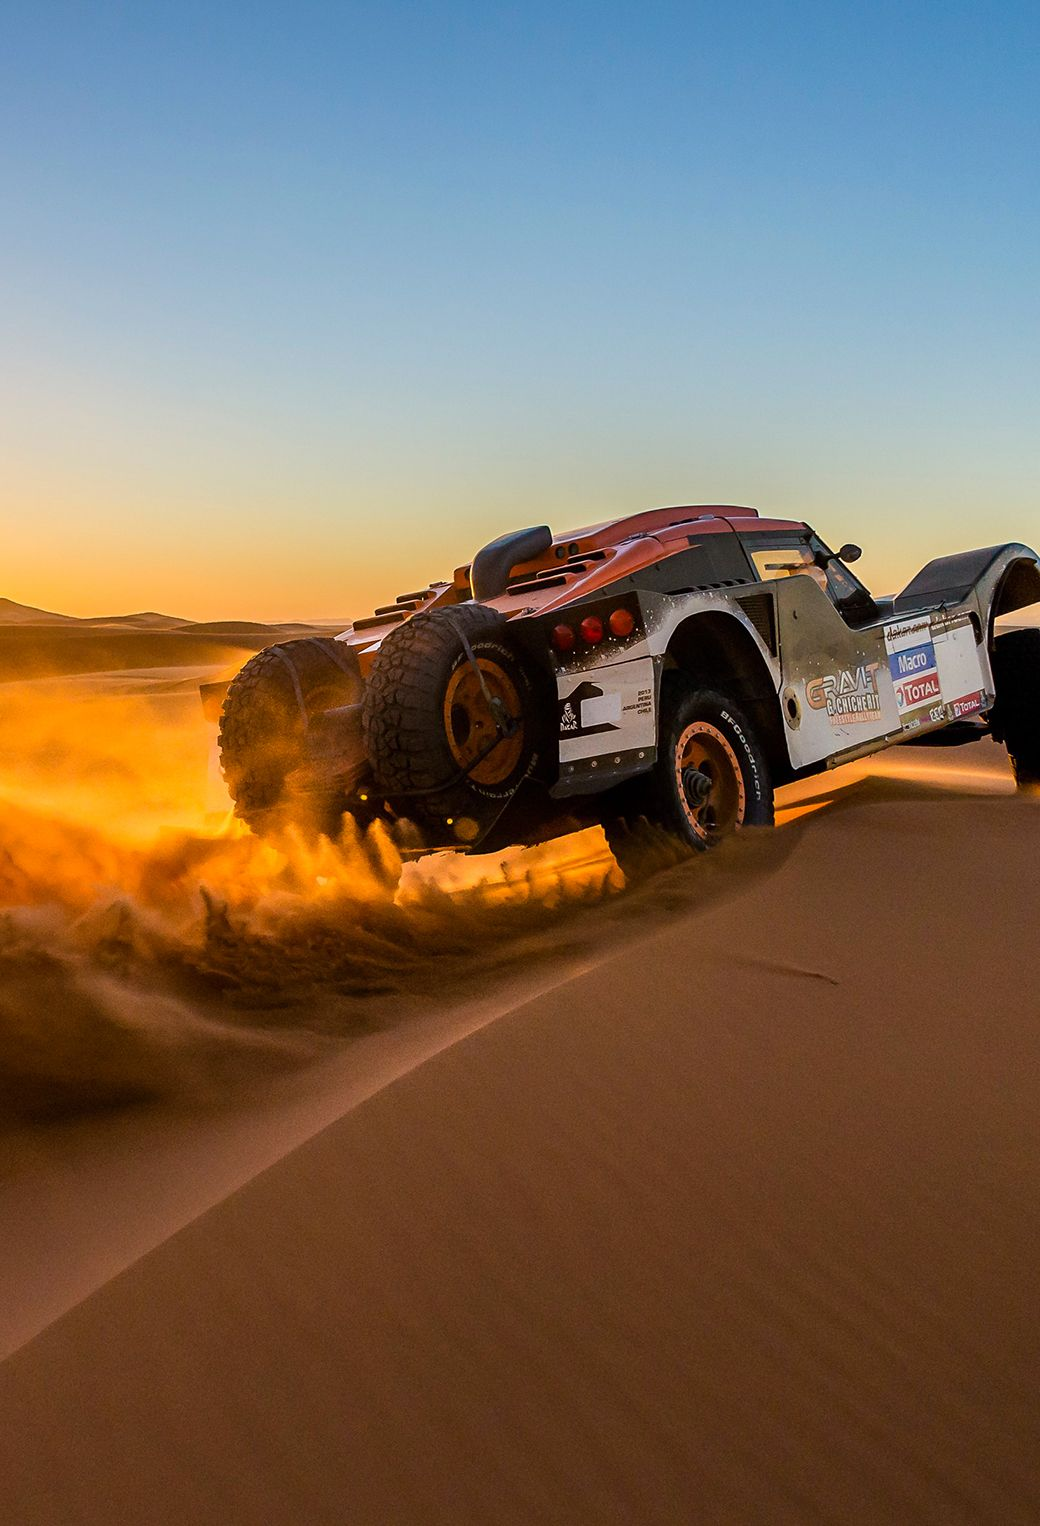 Sunset Over Buggy In Dakar Rally Rally Car Rally Car Racing Paris Dakar Rally